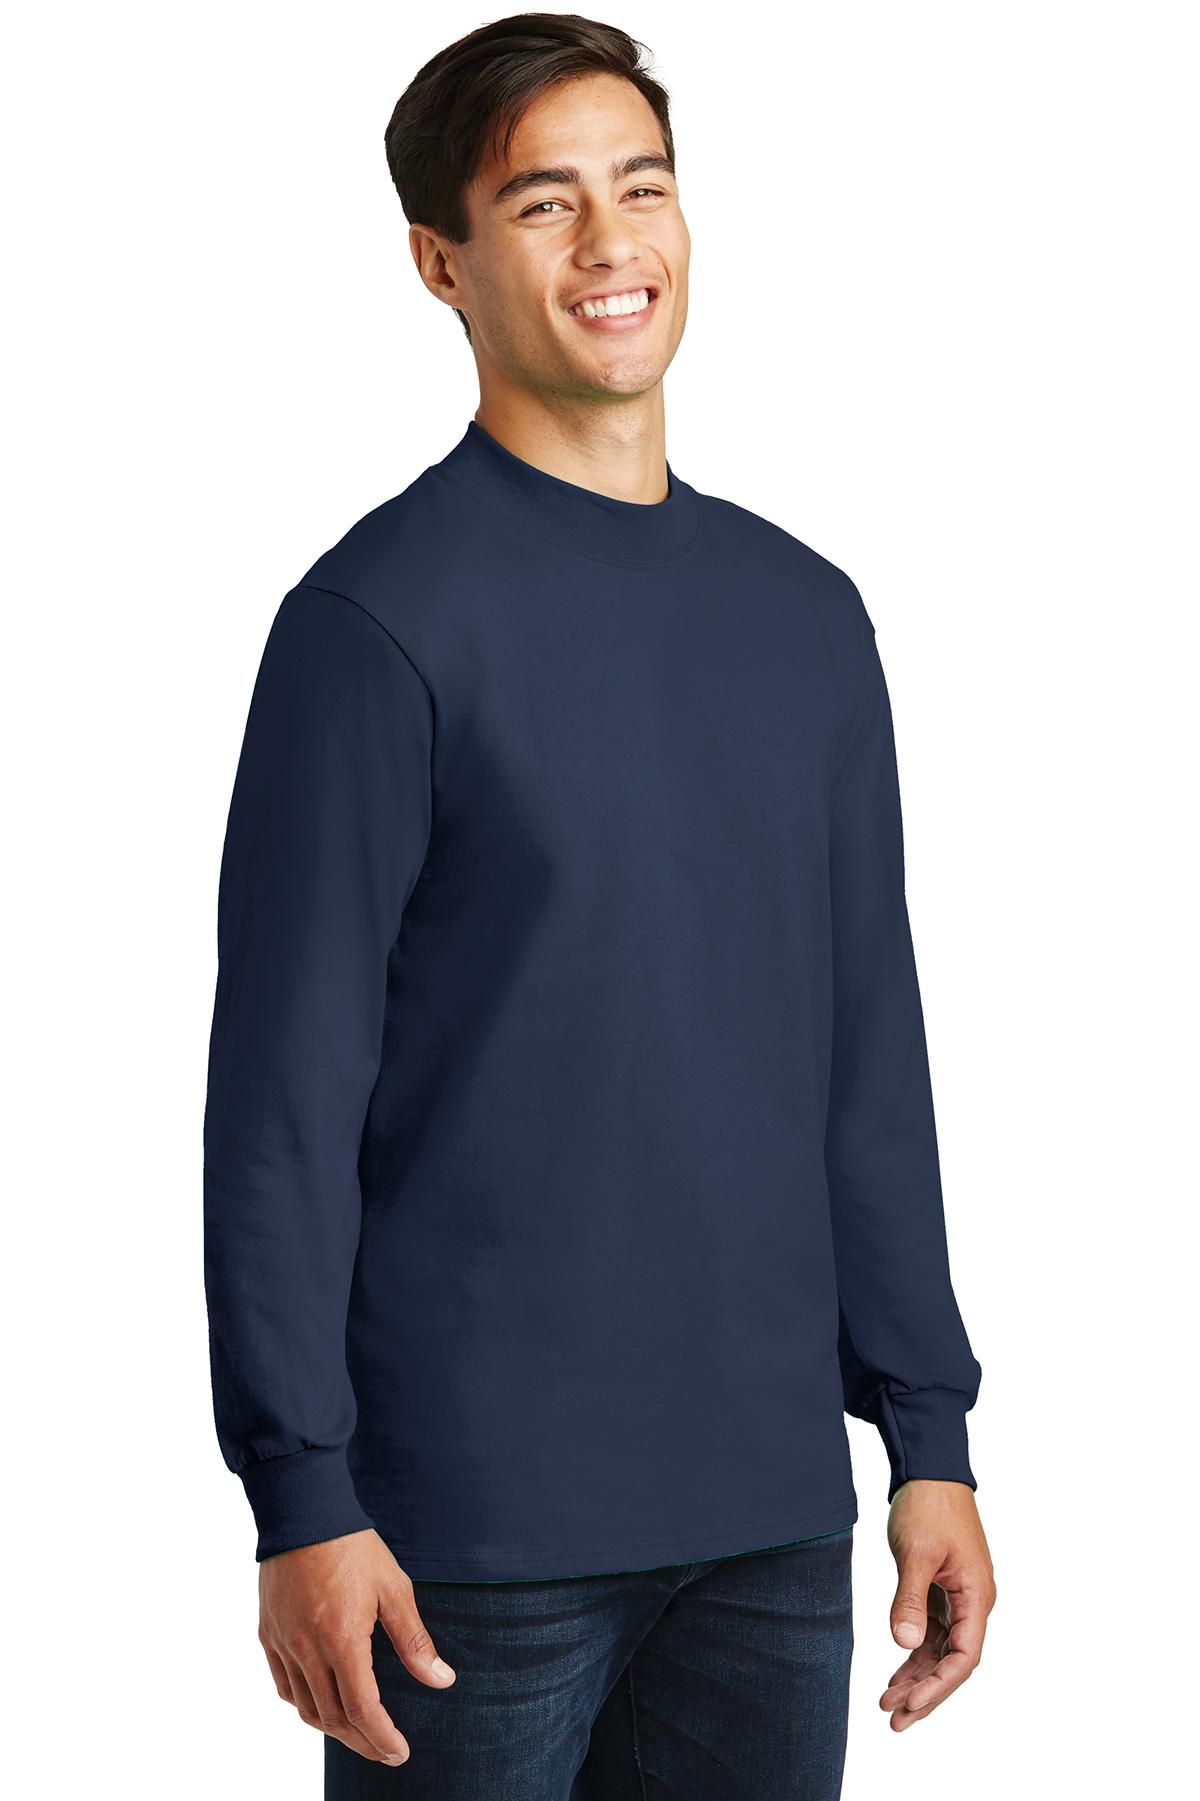 cca75eebe Nike Short Sleeve Mock Turtleneck Shirts – EDGE Engineering and ...